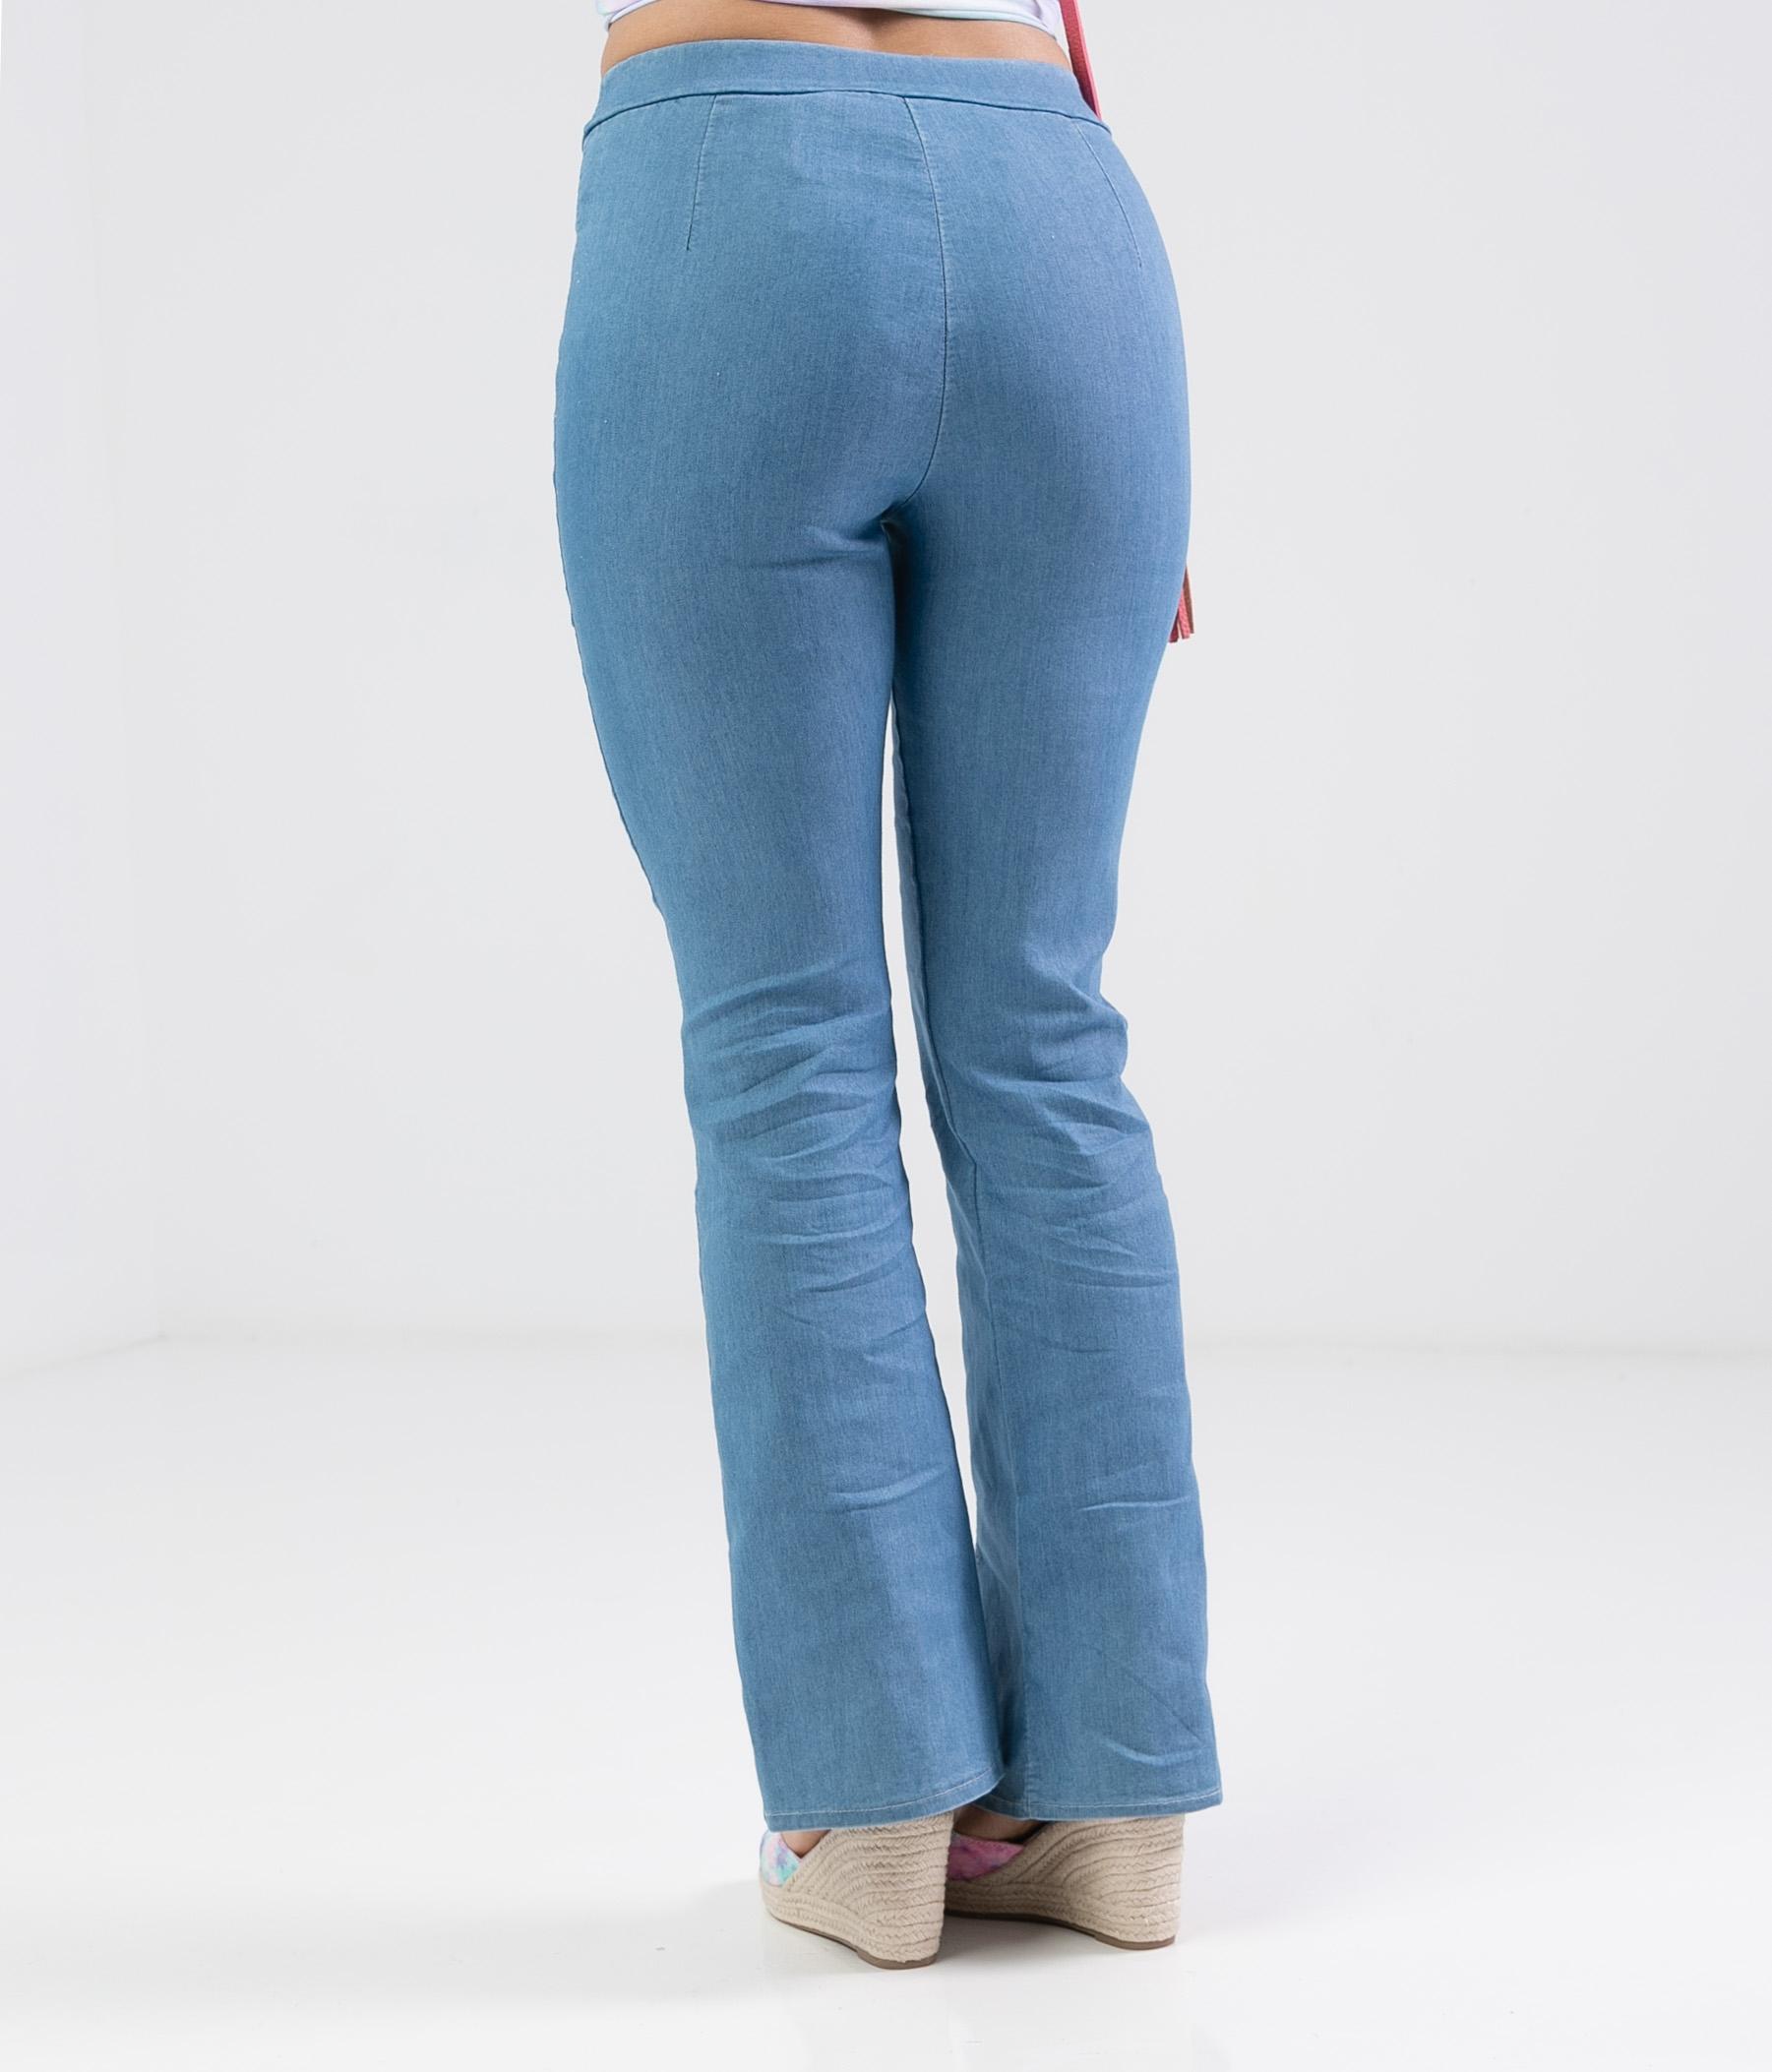 Pantalon Pertrel - Denim